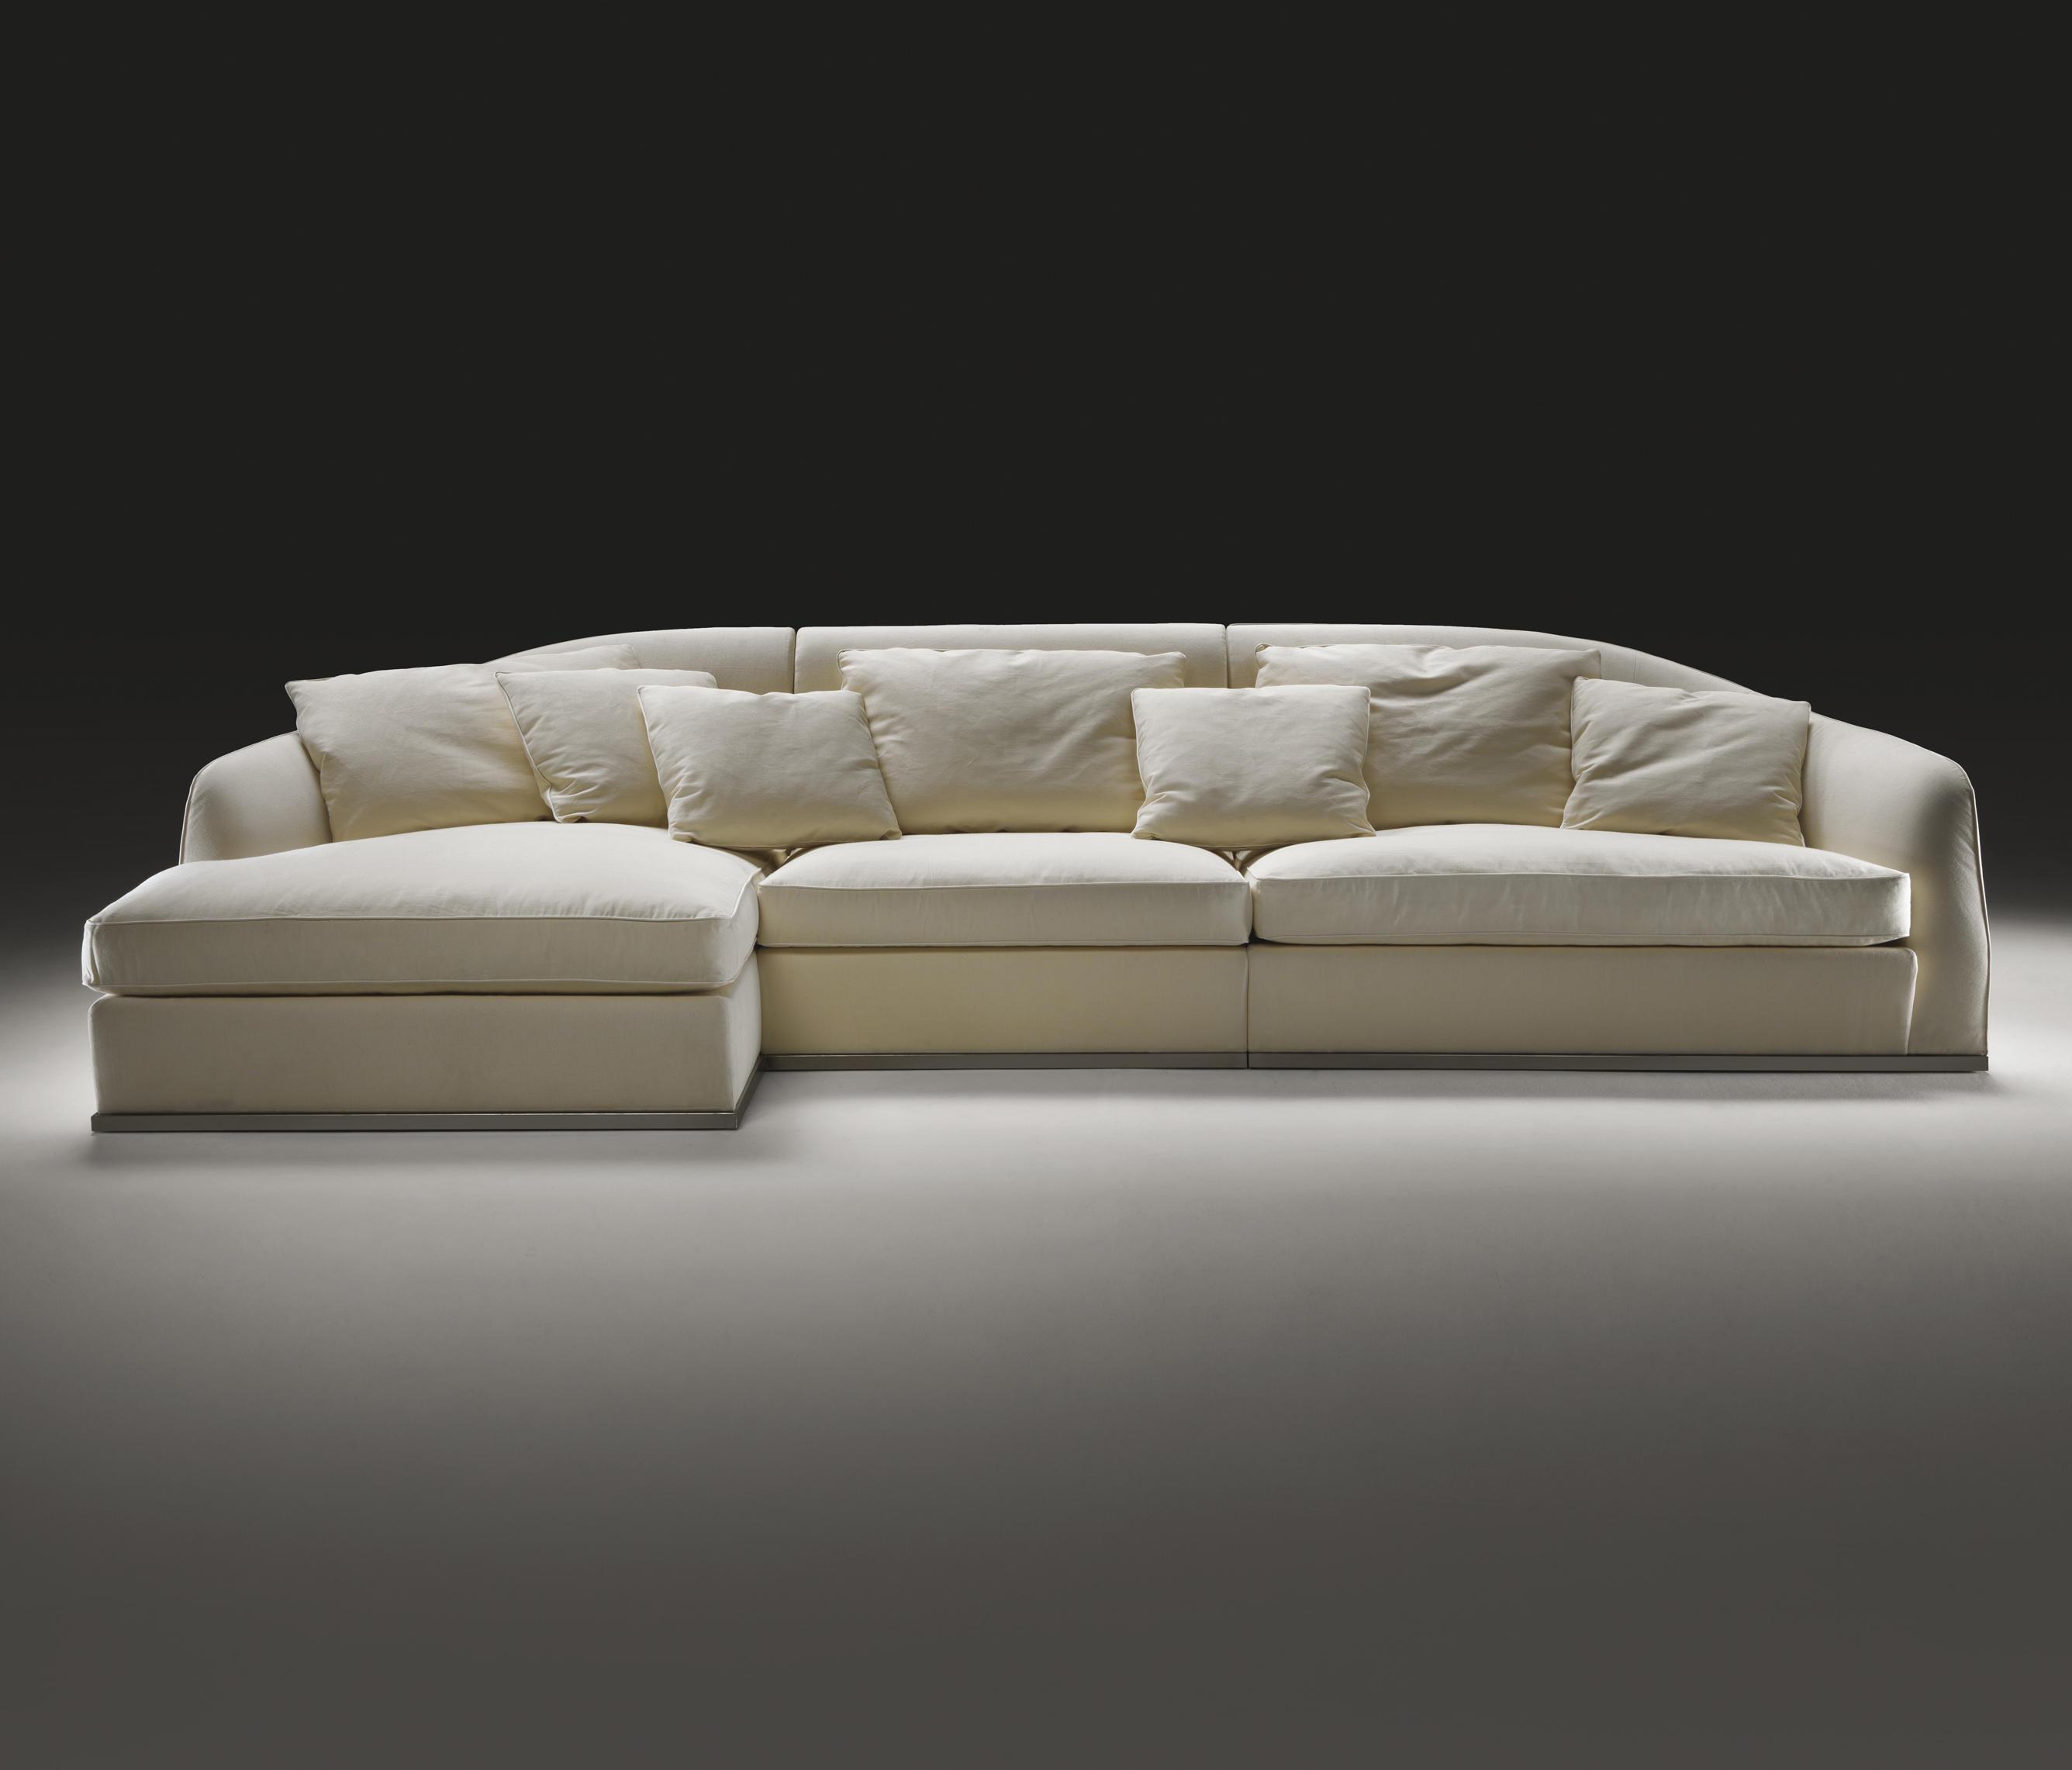 alfred canap s modulaires de flexform mood architonic. Black Bedroom Furniture Sets. Home Design Ideas